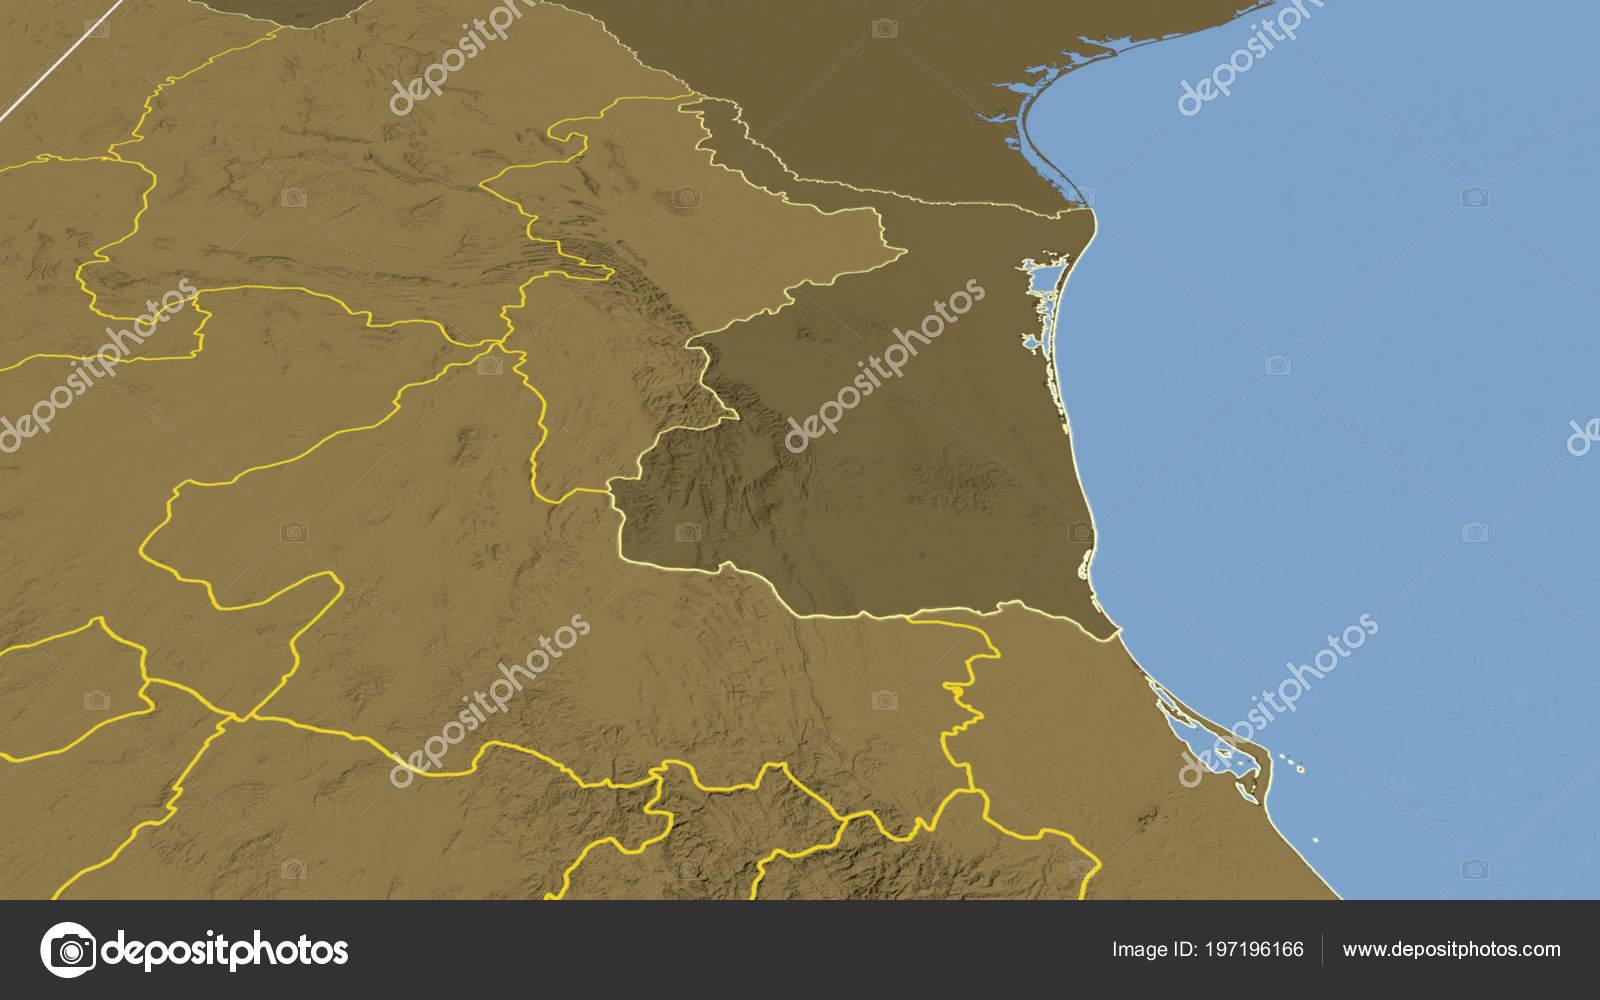 Tamaulipas Region Mexico Outlined Bilevel Elevation Map — Stock ...